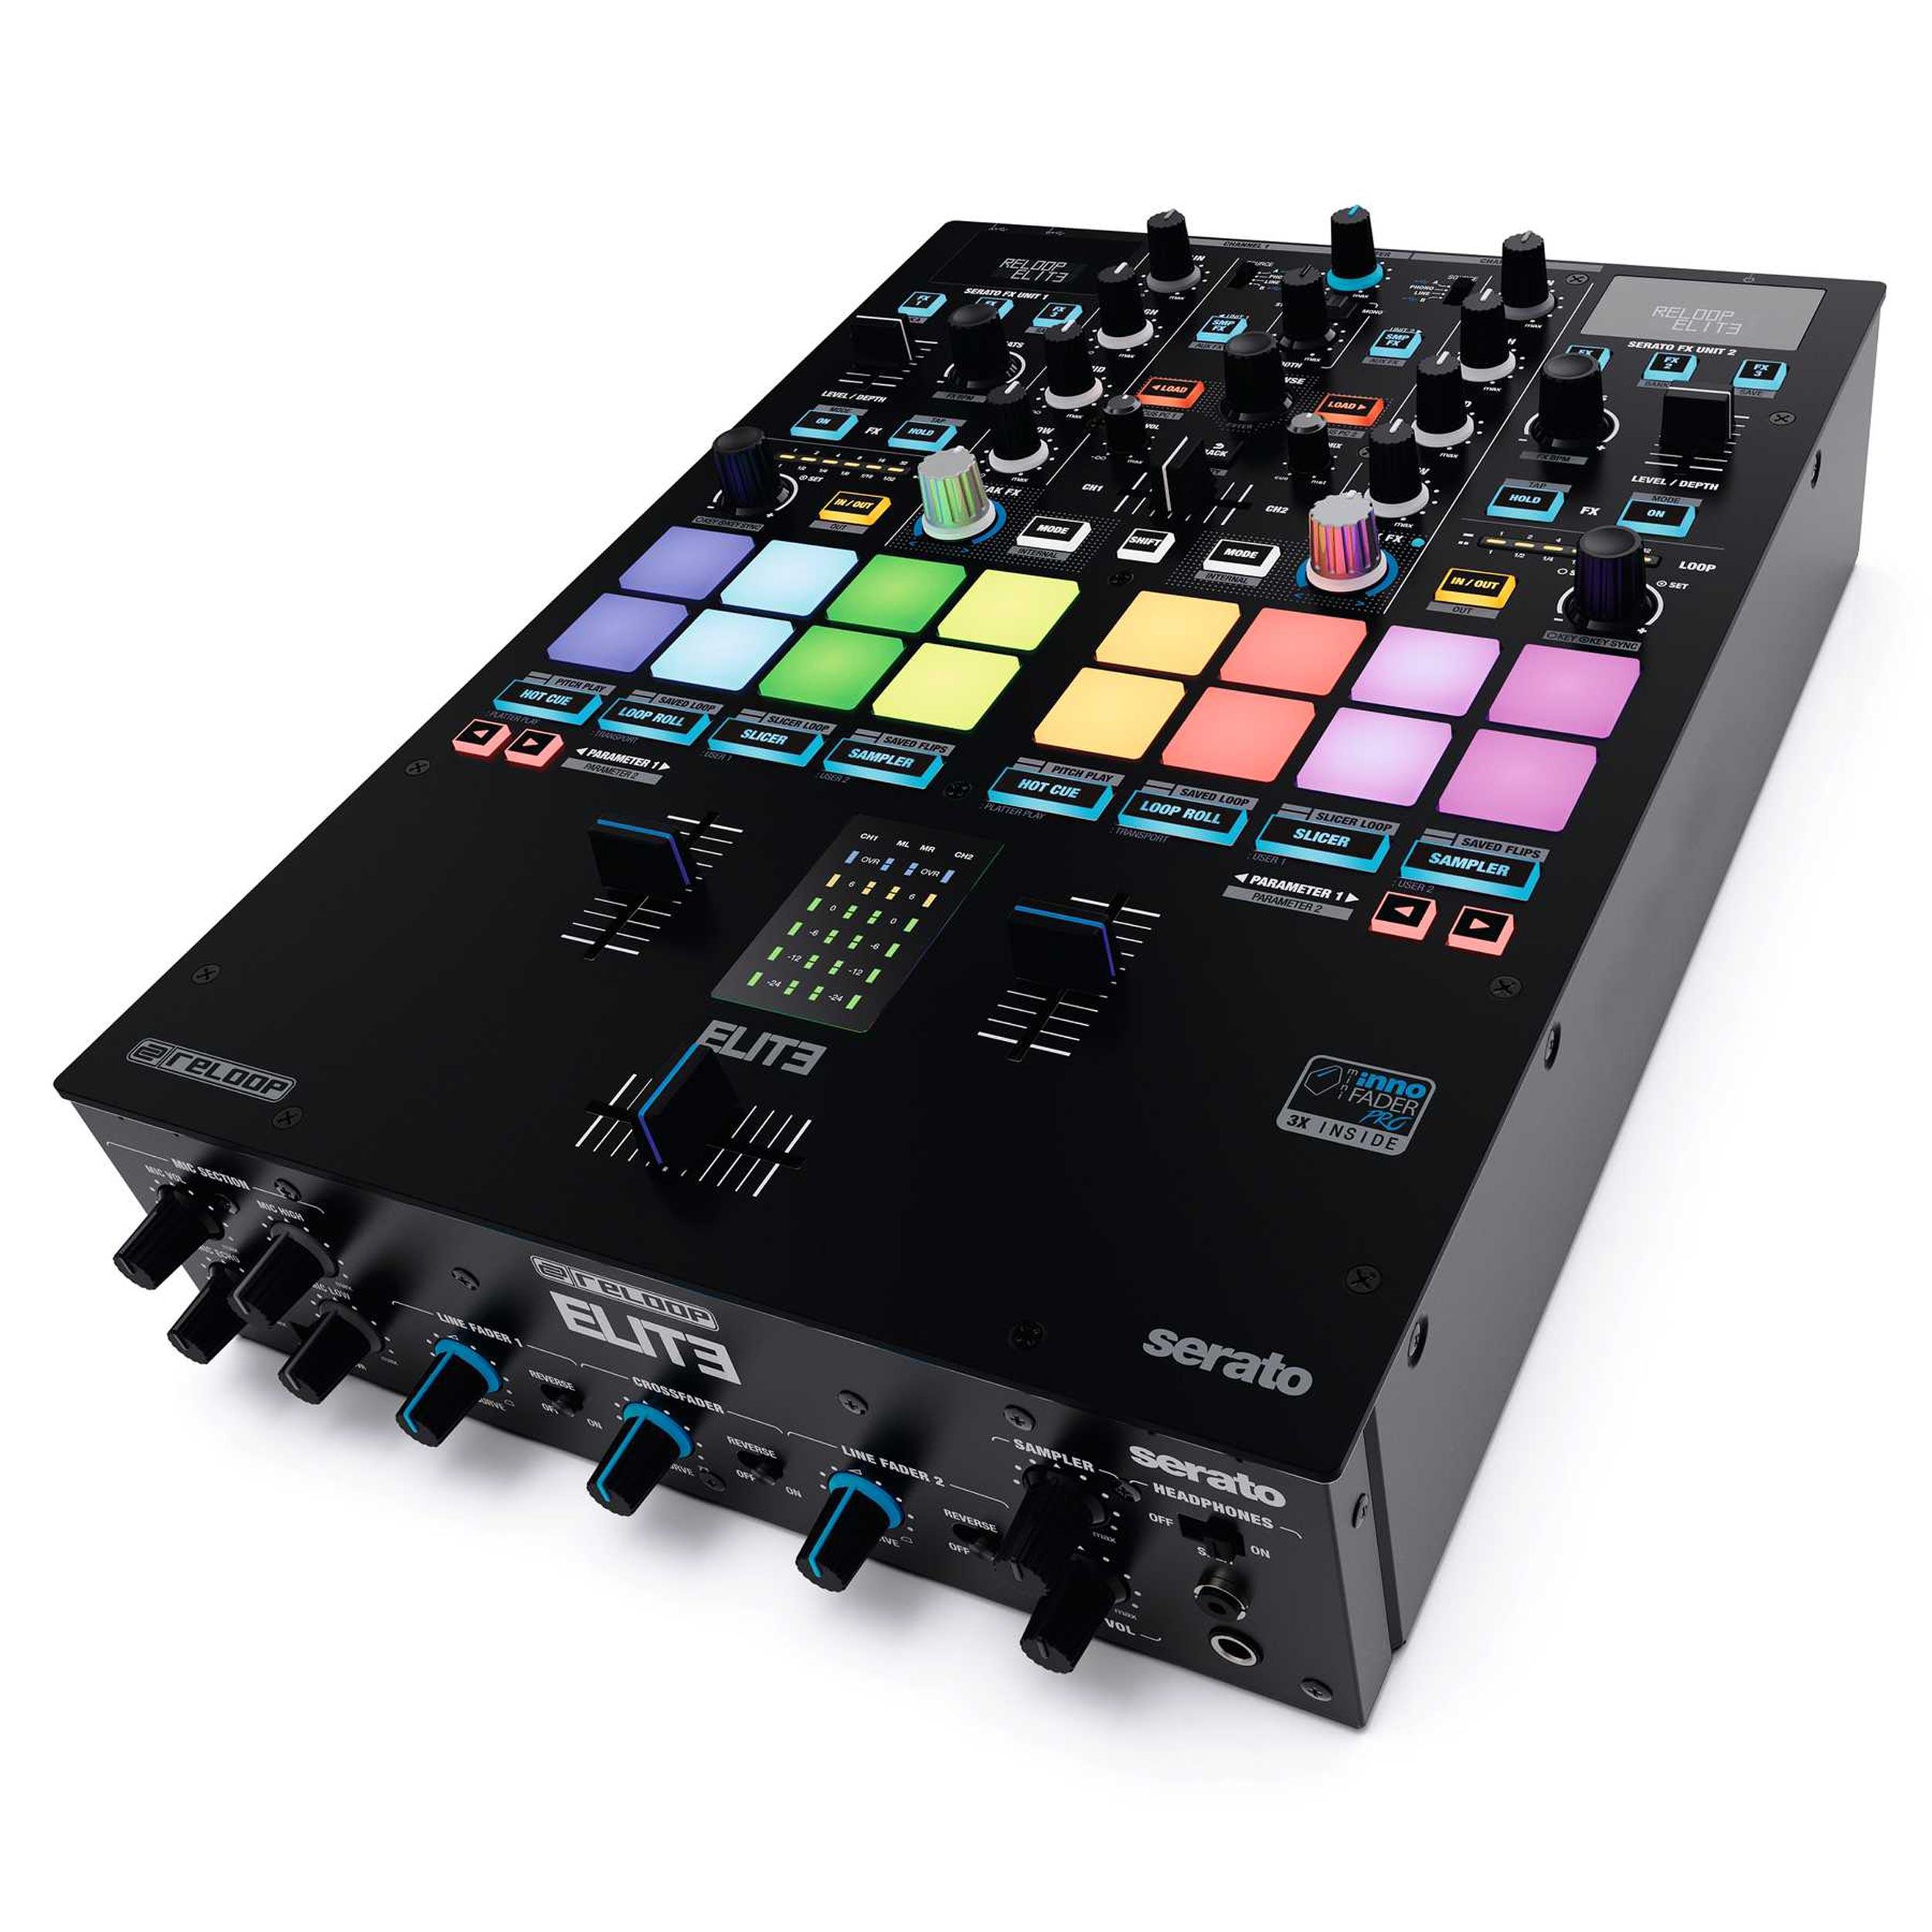 RELOOP ELITE High-Performace DVS Mixer for Serato DJ Pro